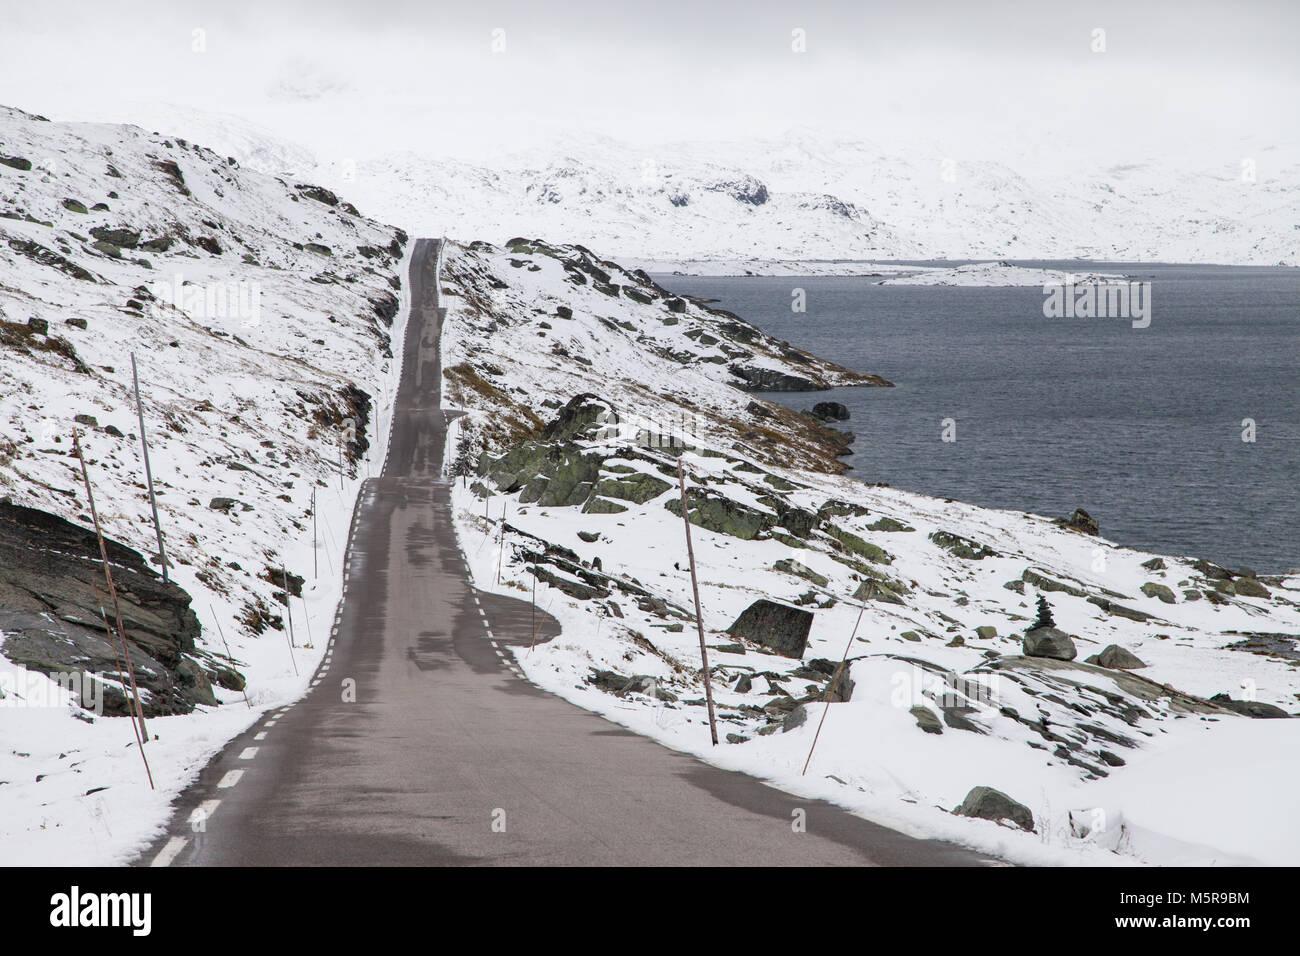 Sognefjellet Mountain Pass, Jotunheimen National Park, Norway. - Stock Image